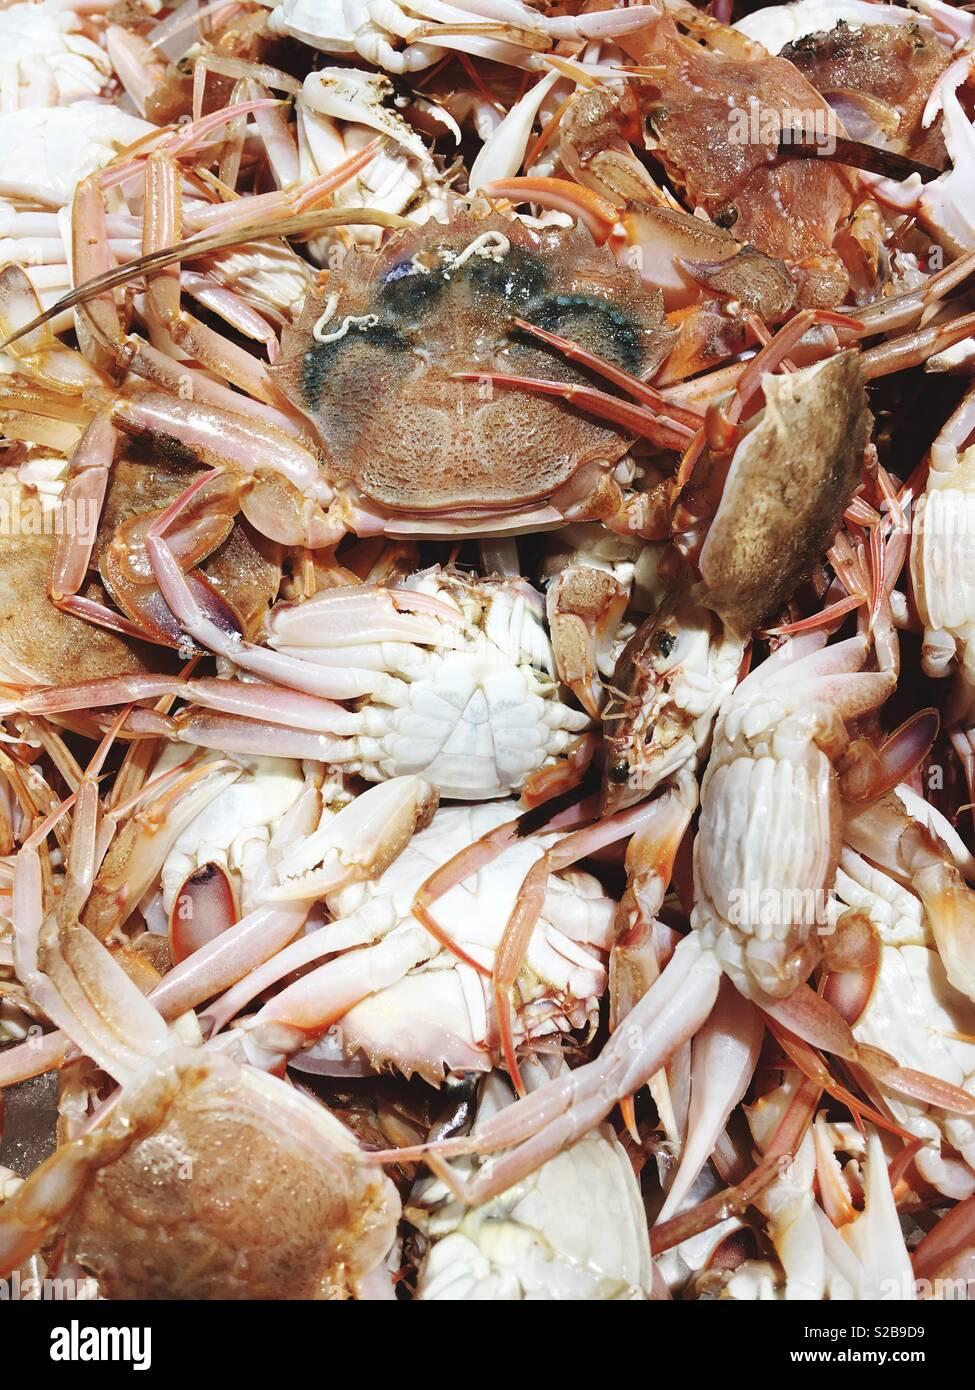 Crabs on display - Stock Image